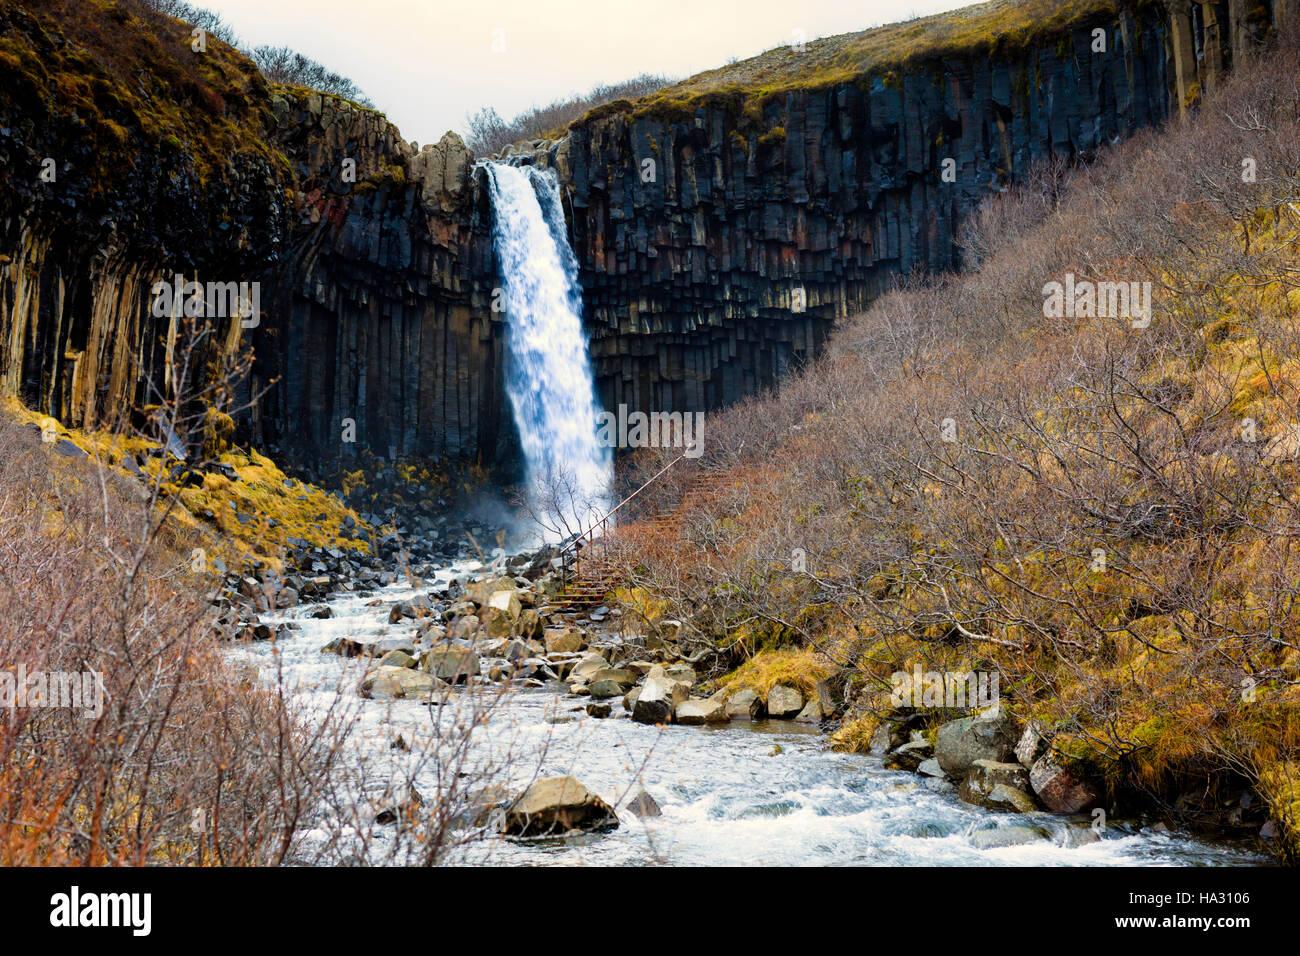 Svartifoss (Black Falls) waterfall in Skaftafell in Vatnajokull National Park in Iceland, - Stock Image